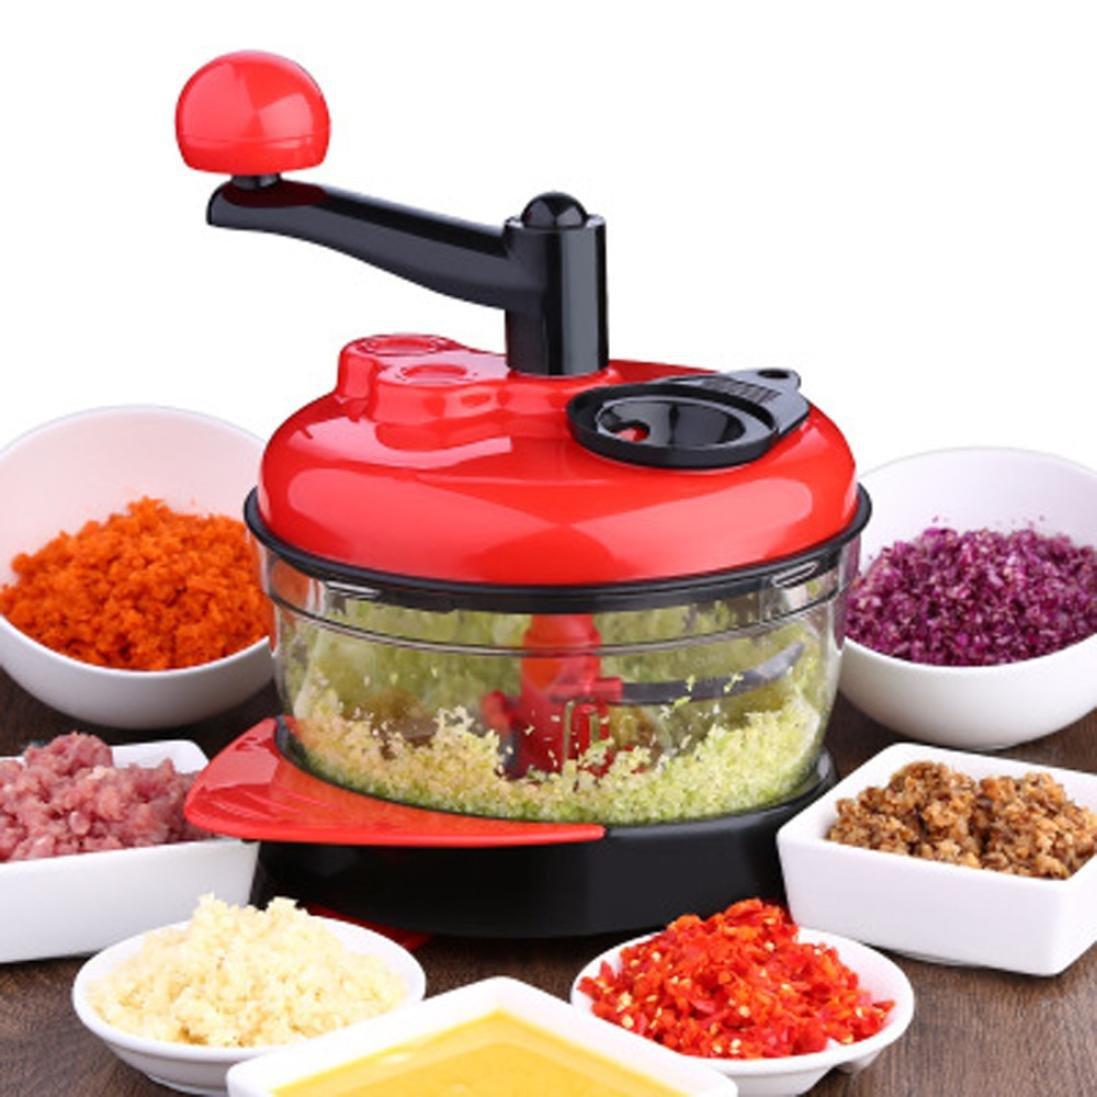 Multi-function Manual Food Processor Meat Grinder Vegetable Chopper Eggs Separator Kitchen Helper Gessppo